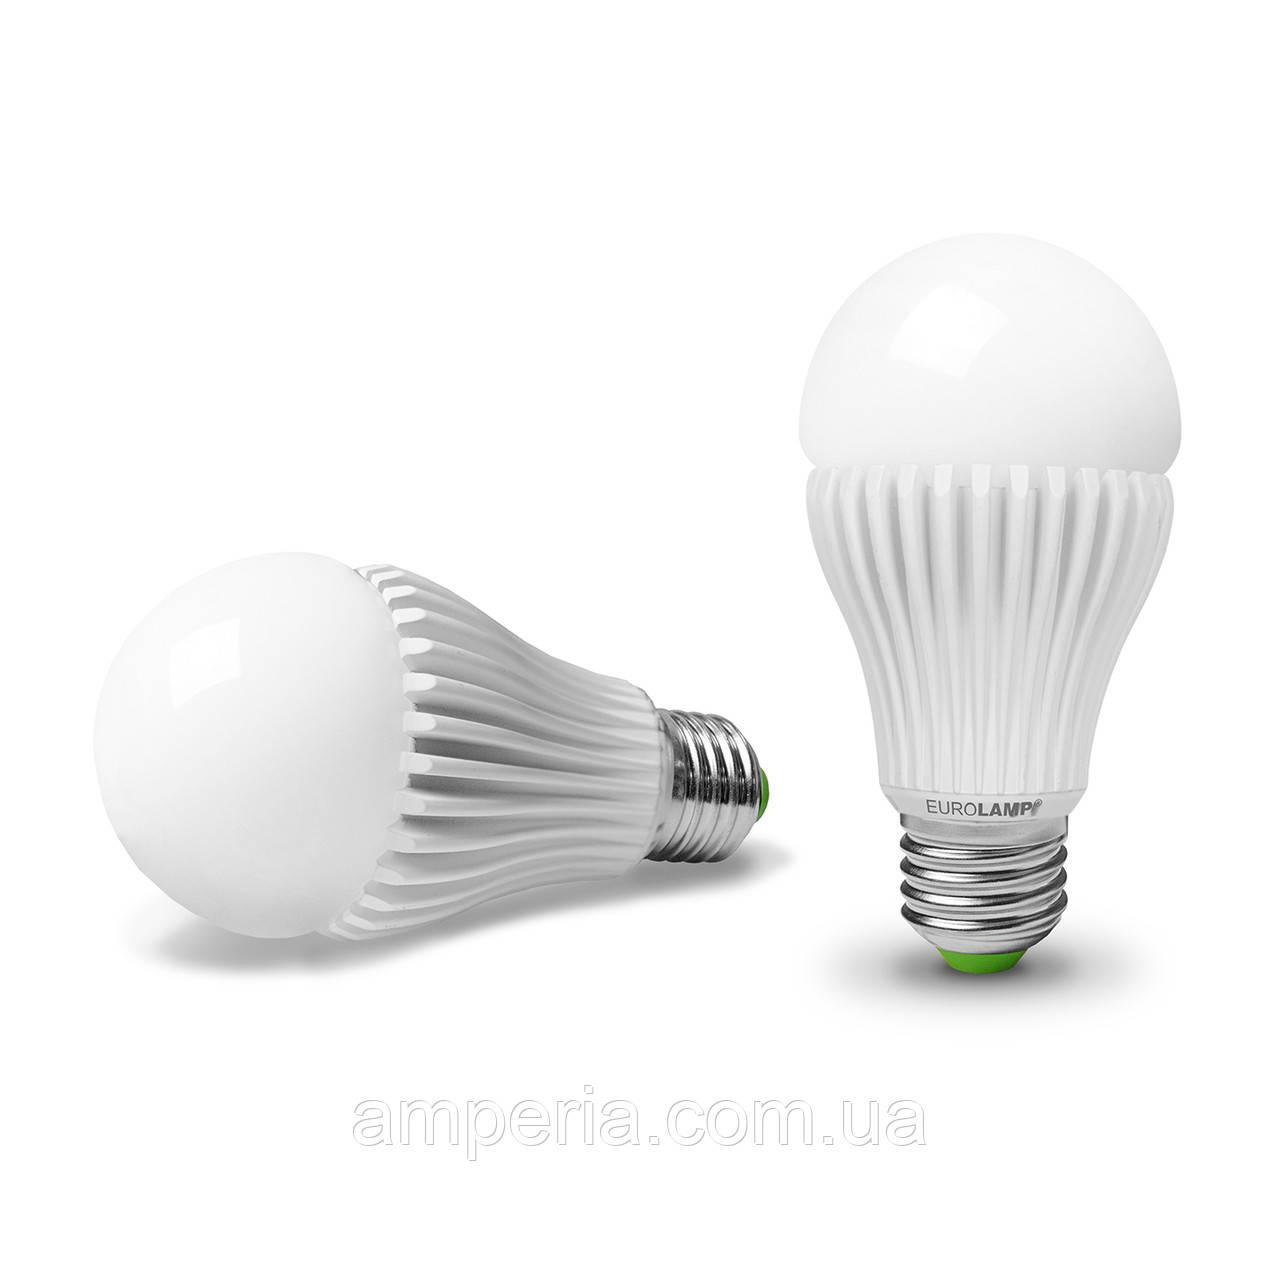 EUROLAMP LED Лампа ЕКО А65 20W E27 4000K (LED-A65-20274(D))